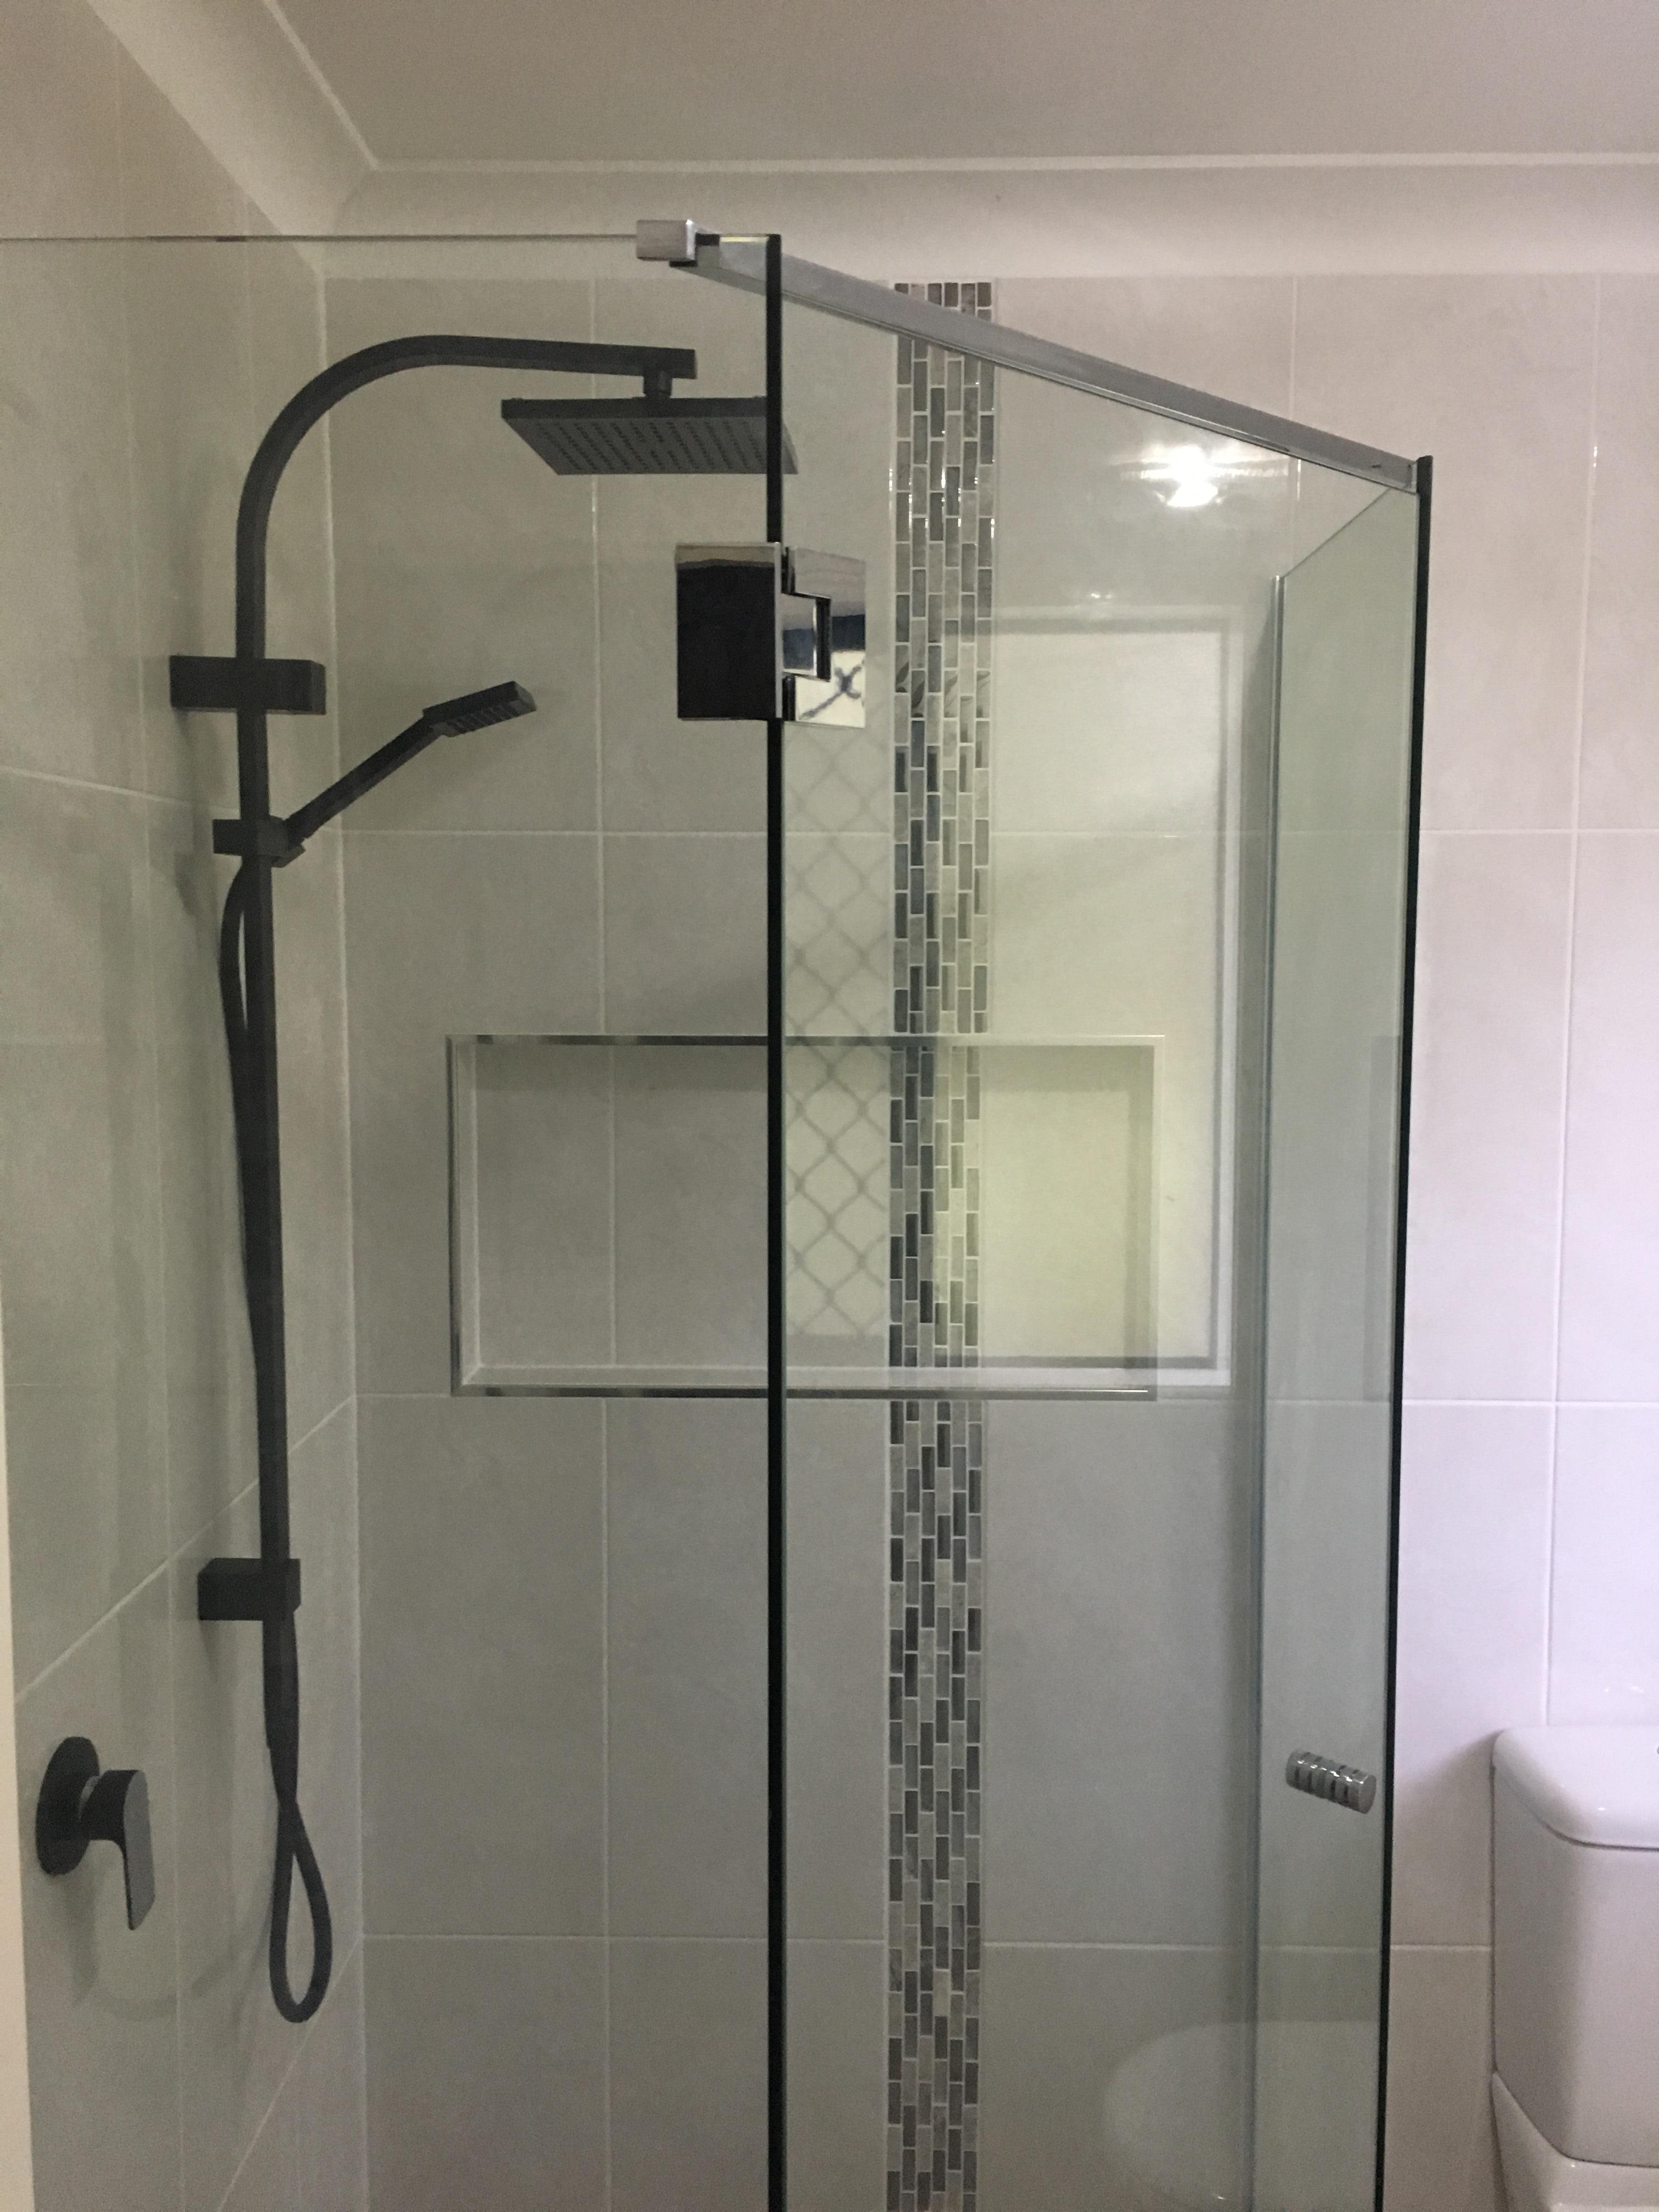 Bathroom Renovation Supplies Toowoomba : Toowoomba bathroom renovations